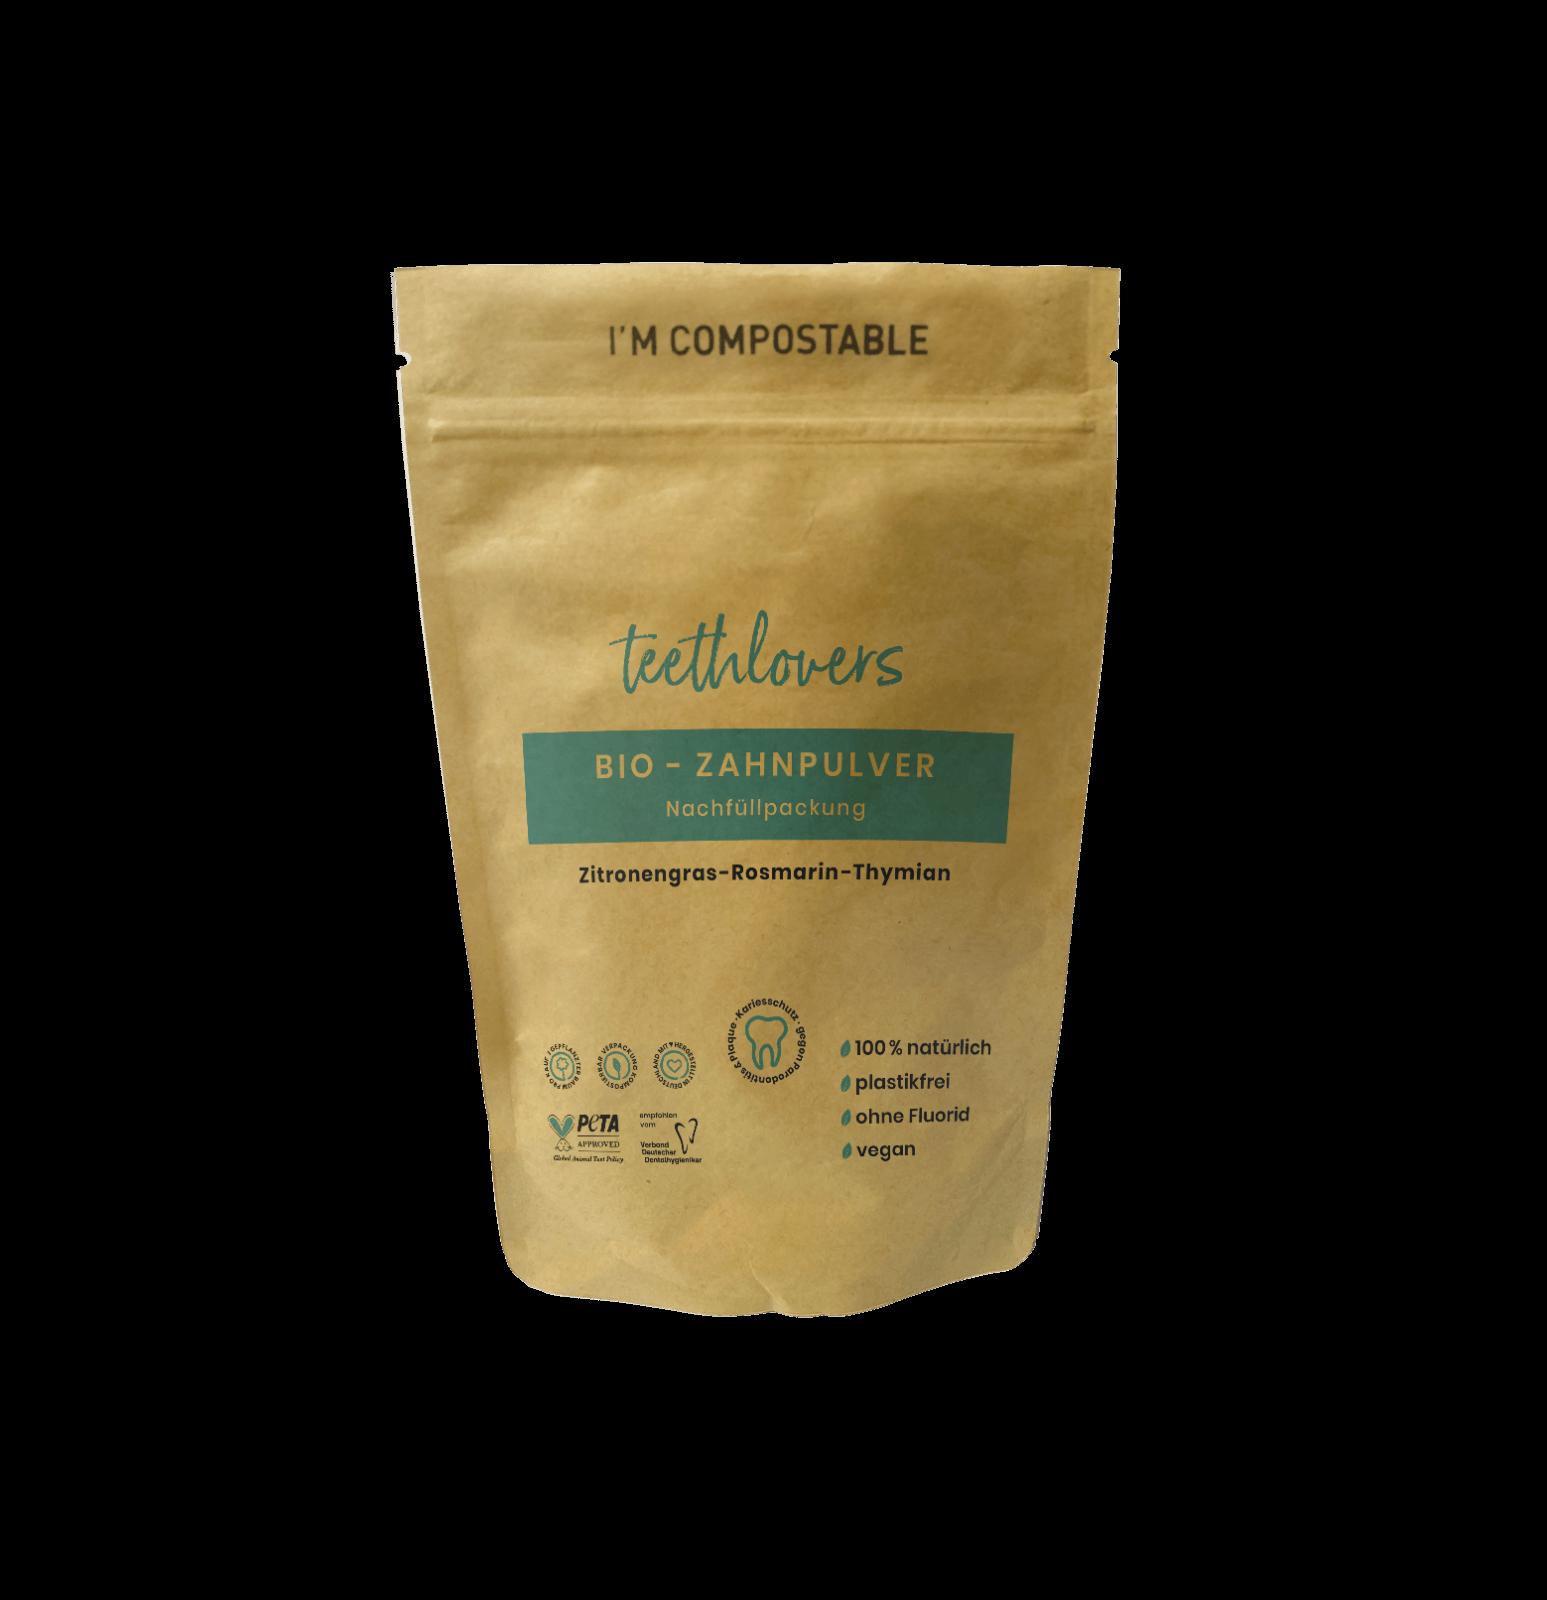 teethlovers kompostierbare Nachfüllpackung Zitronegras-Rosmarin-Thymian